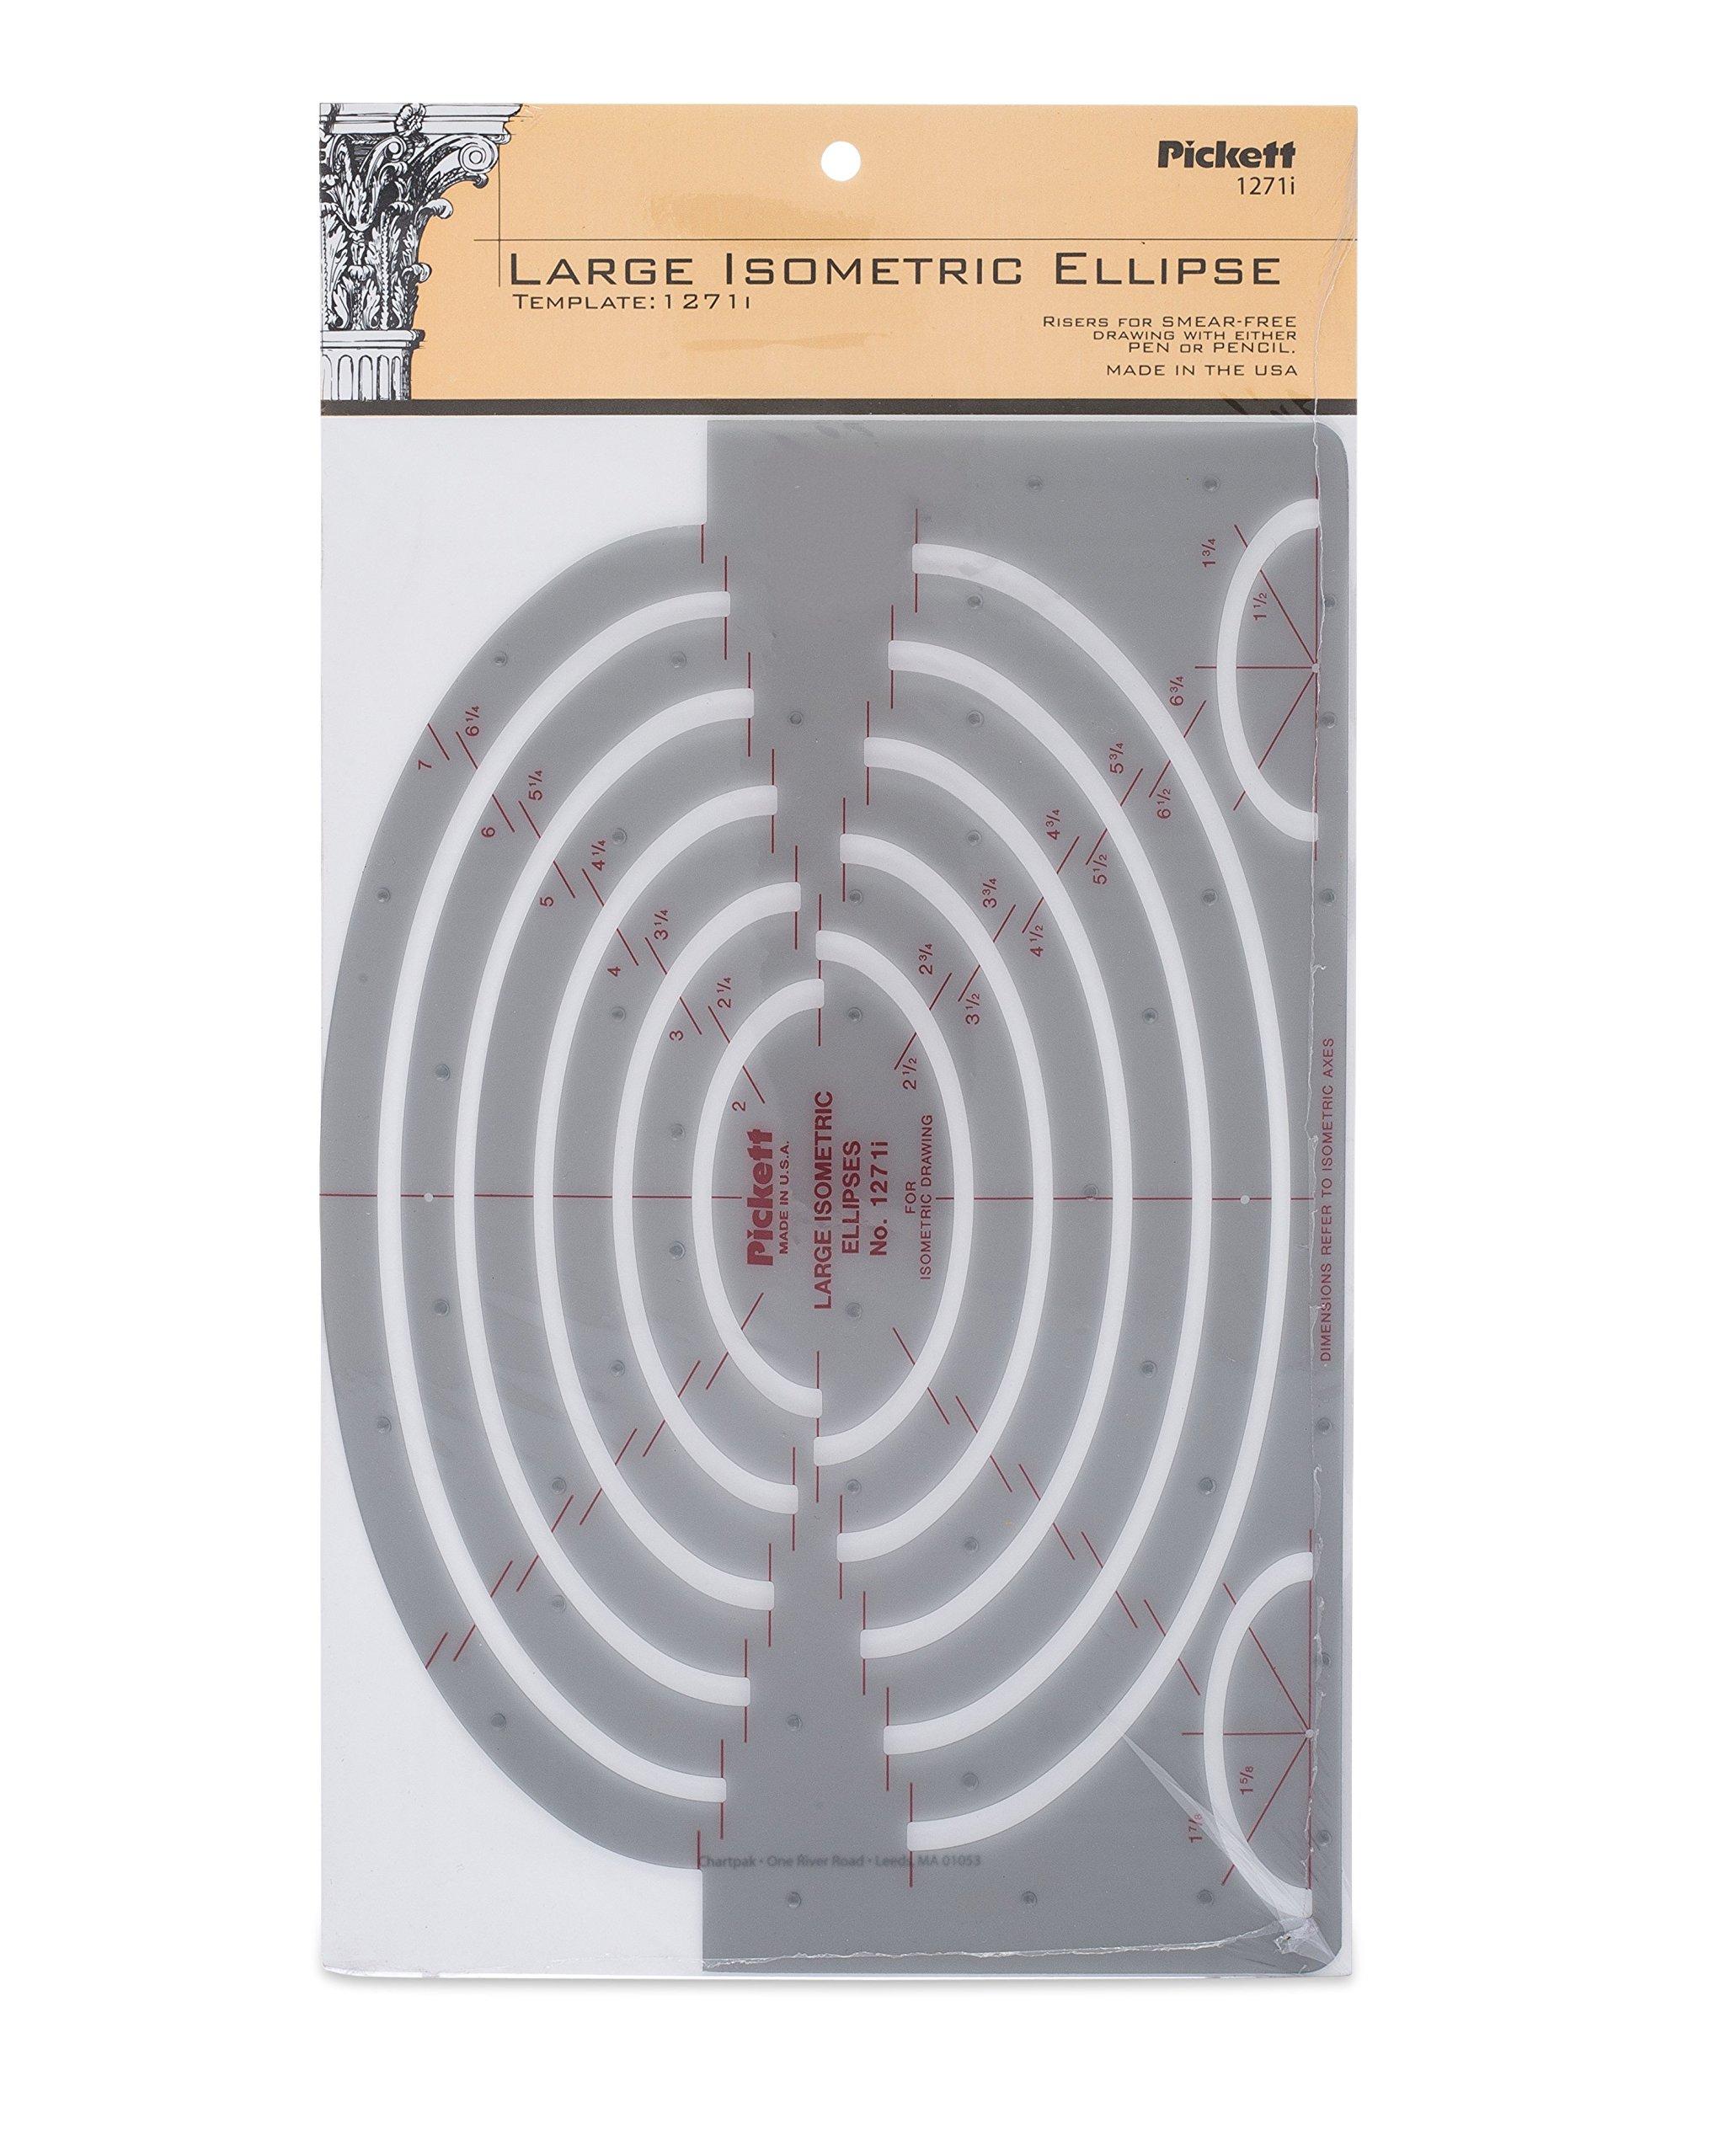 Pickett Large Isometric Ellipse Template (1271I) by Pickett